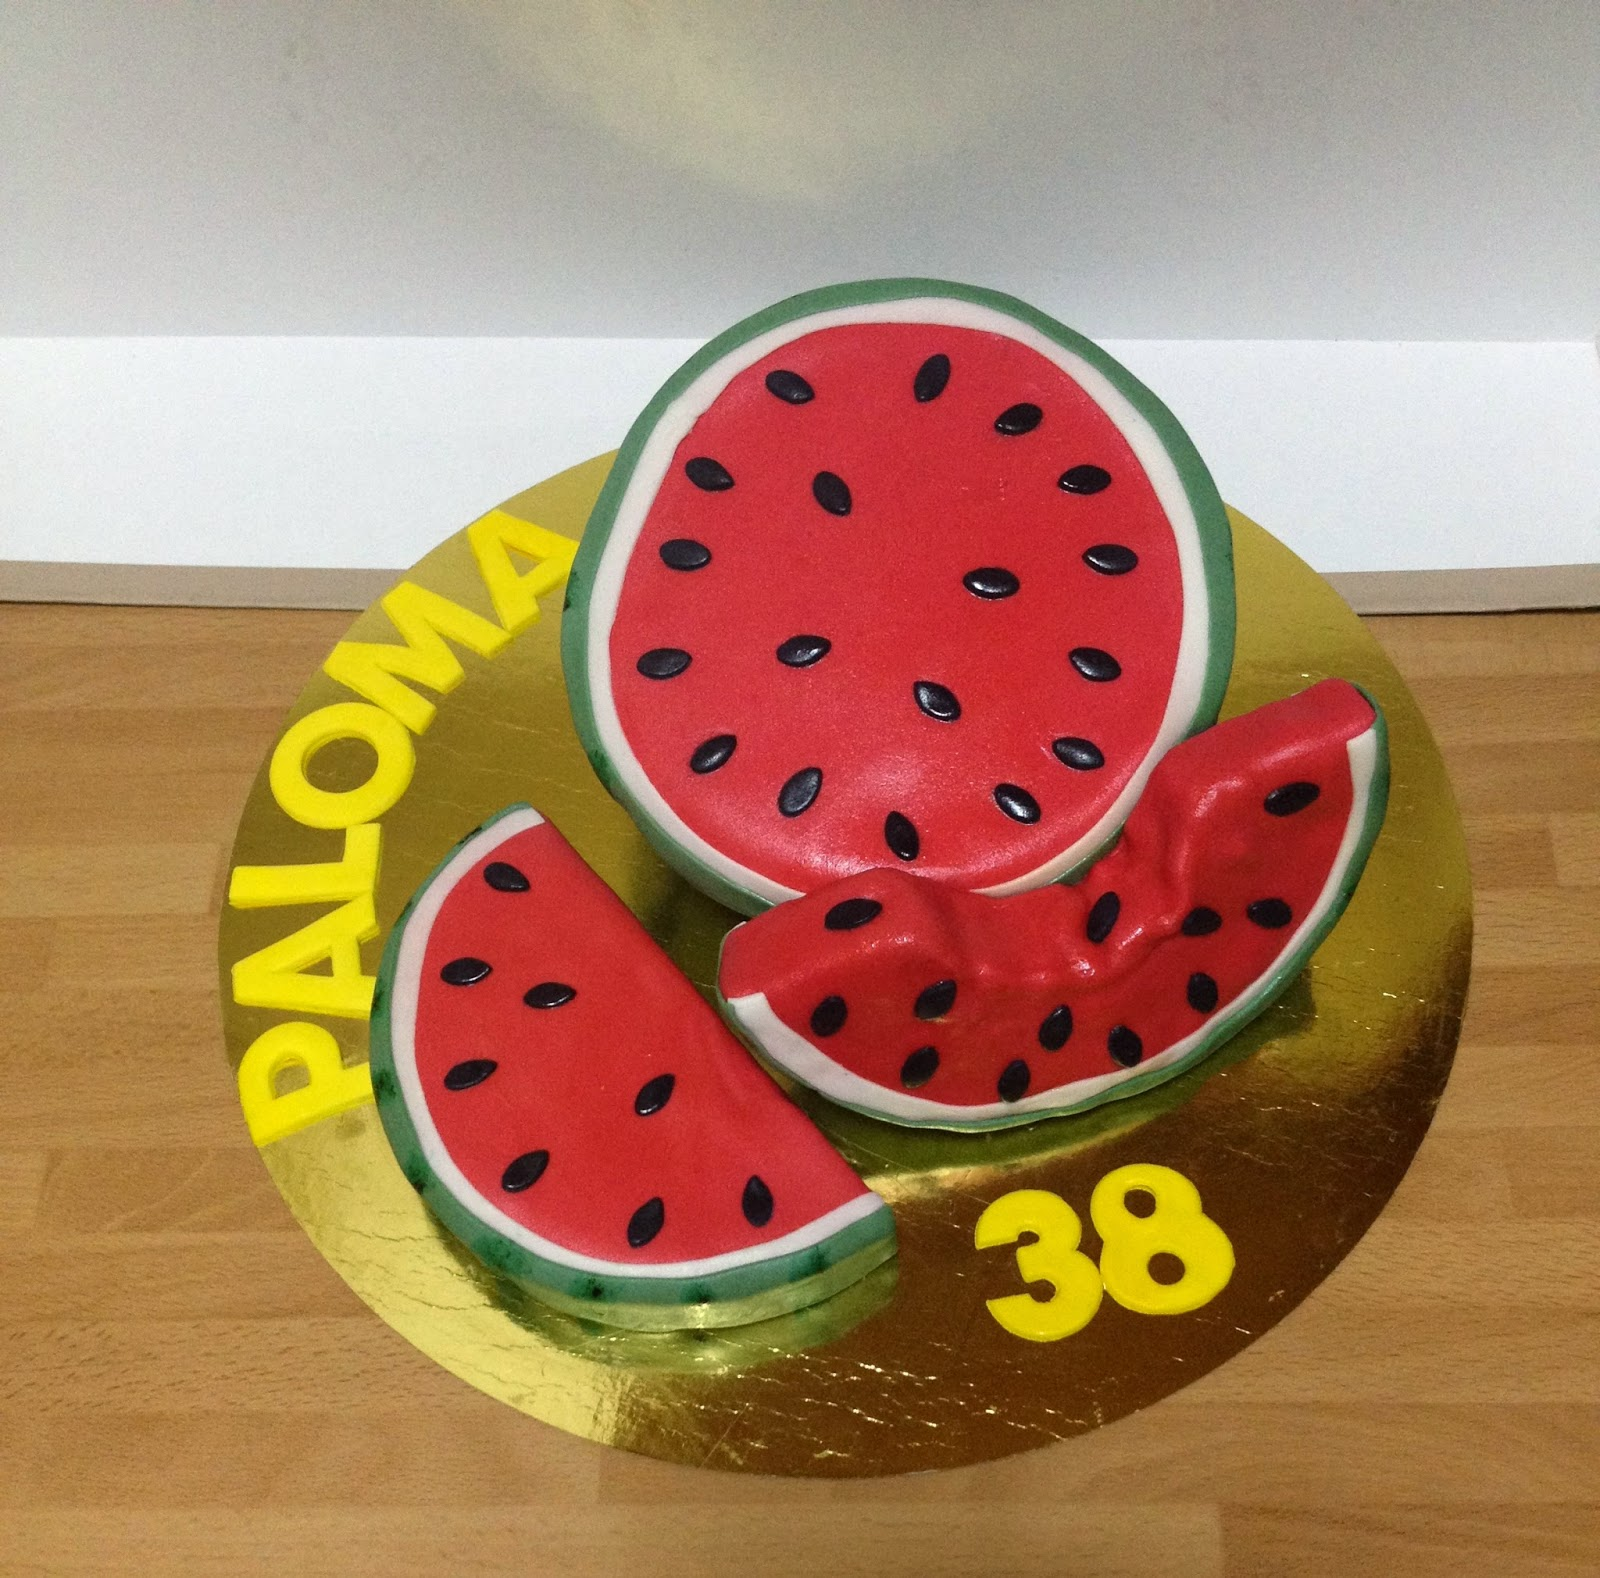 tarta sandia; tarta fondant sandia; tarta decorada sandia